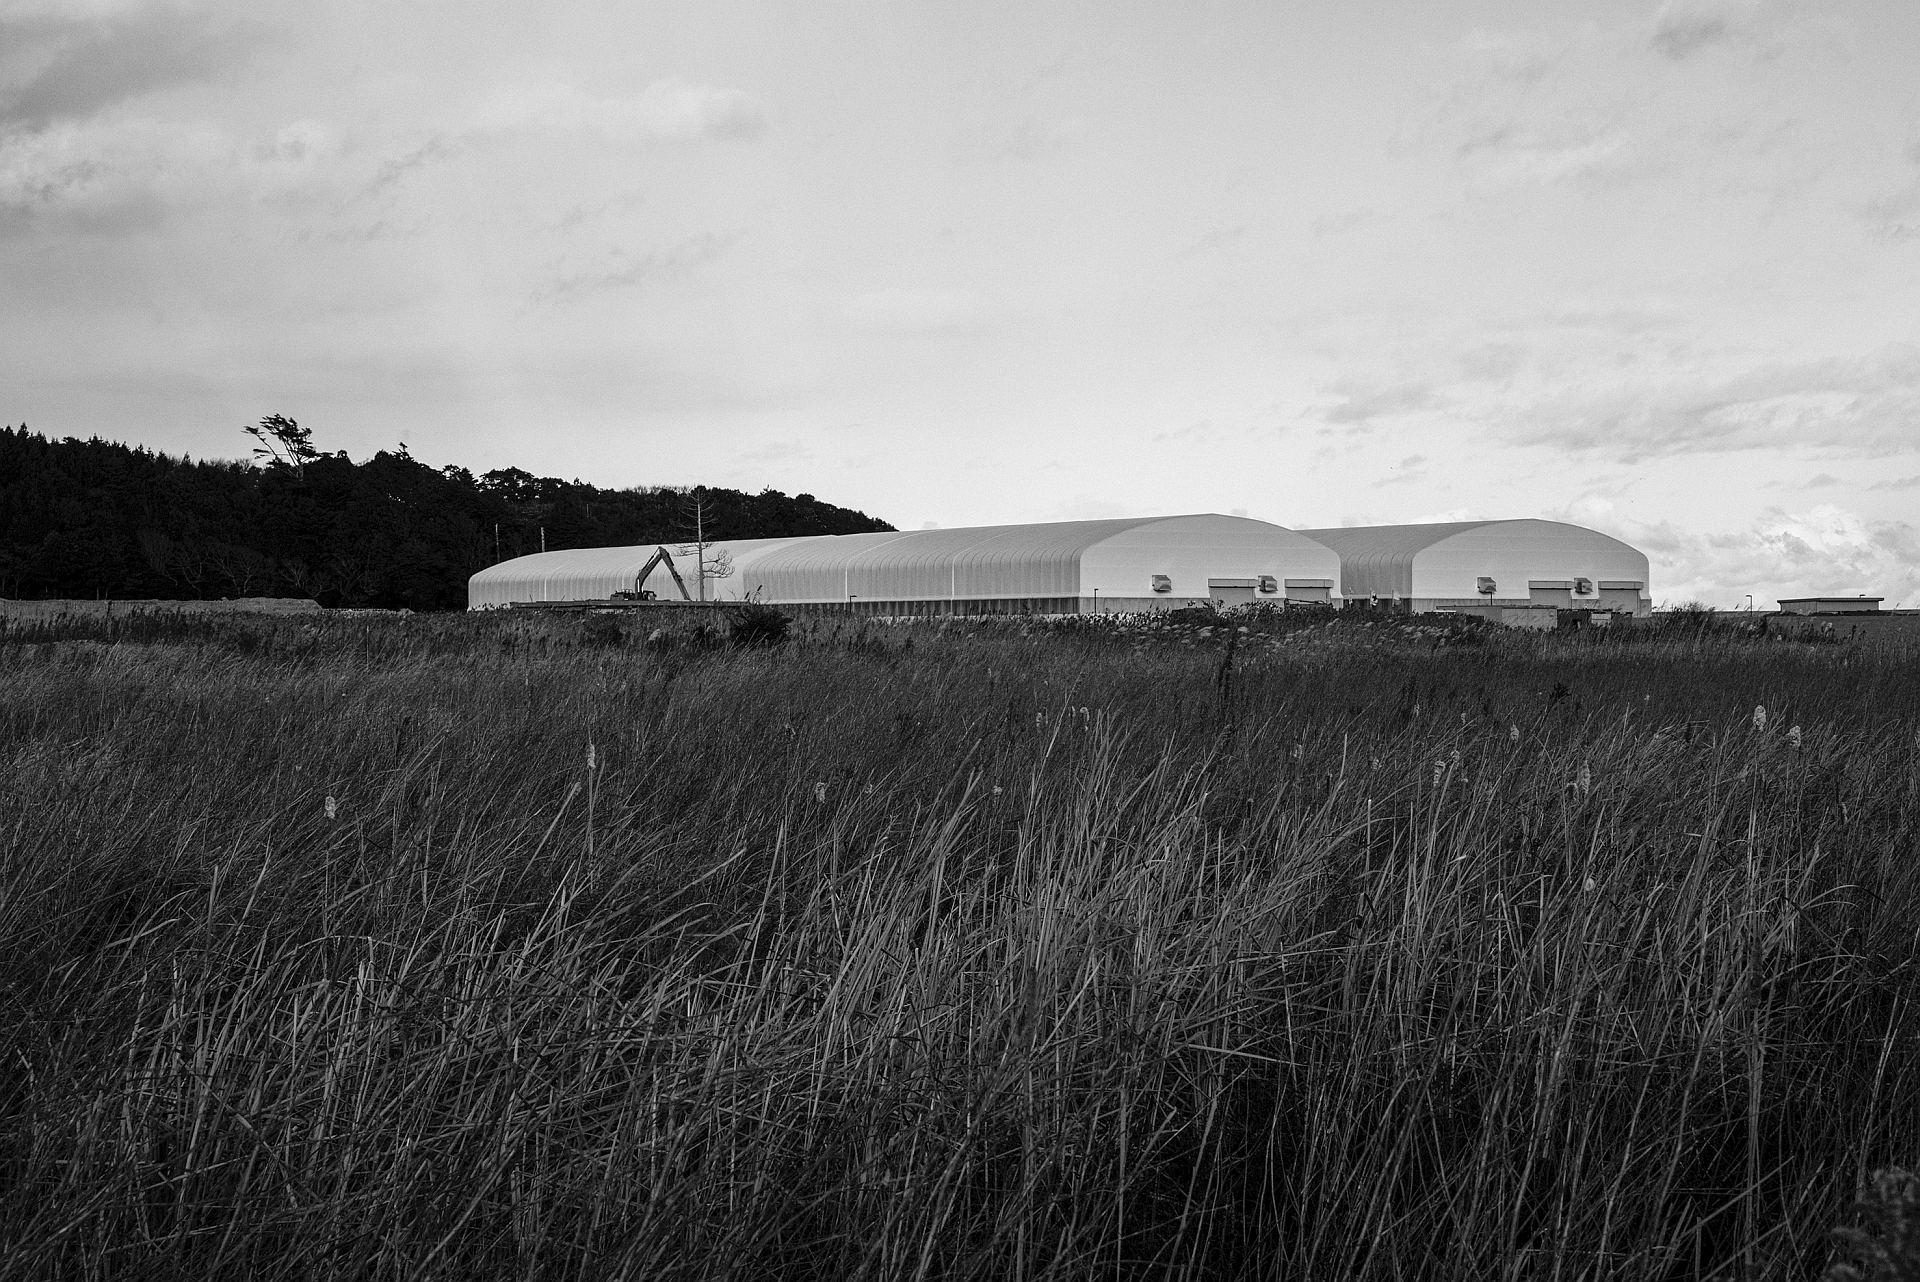 06 – Radioactive Warehouses